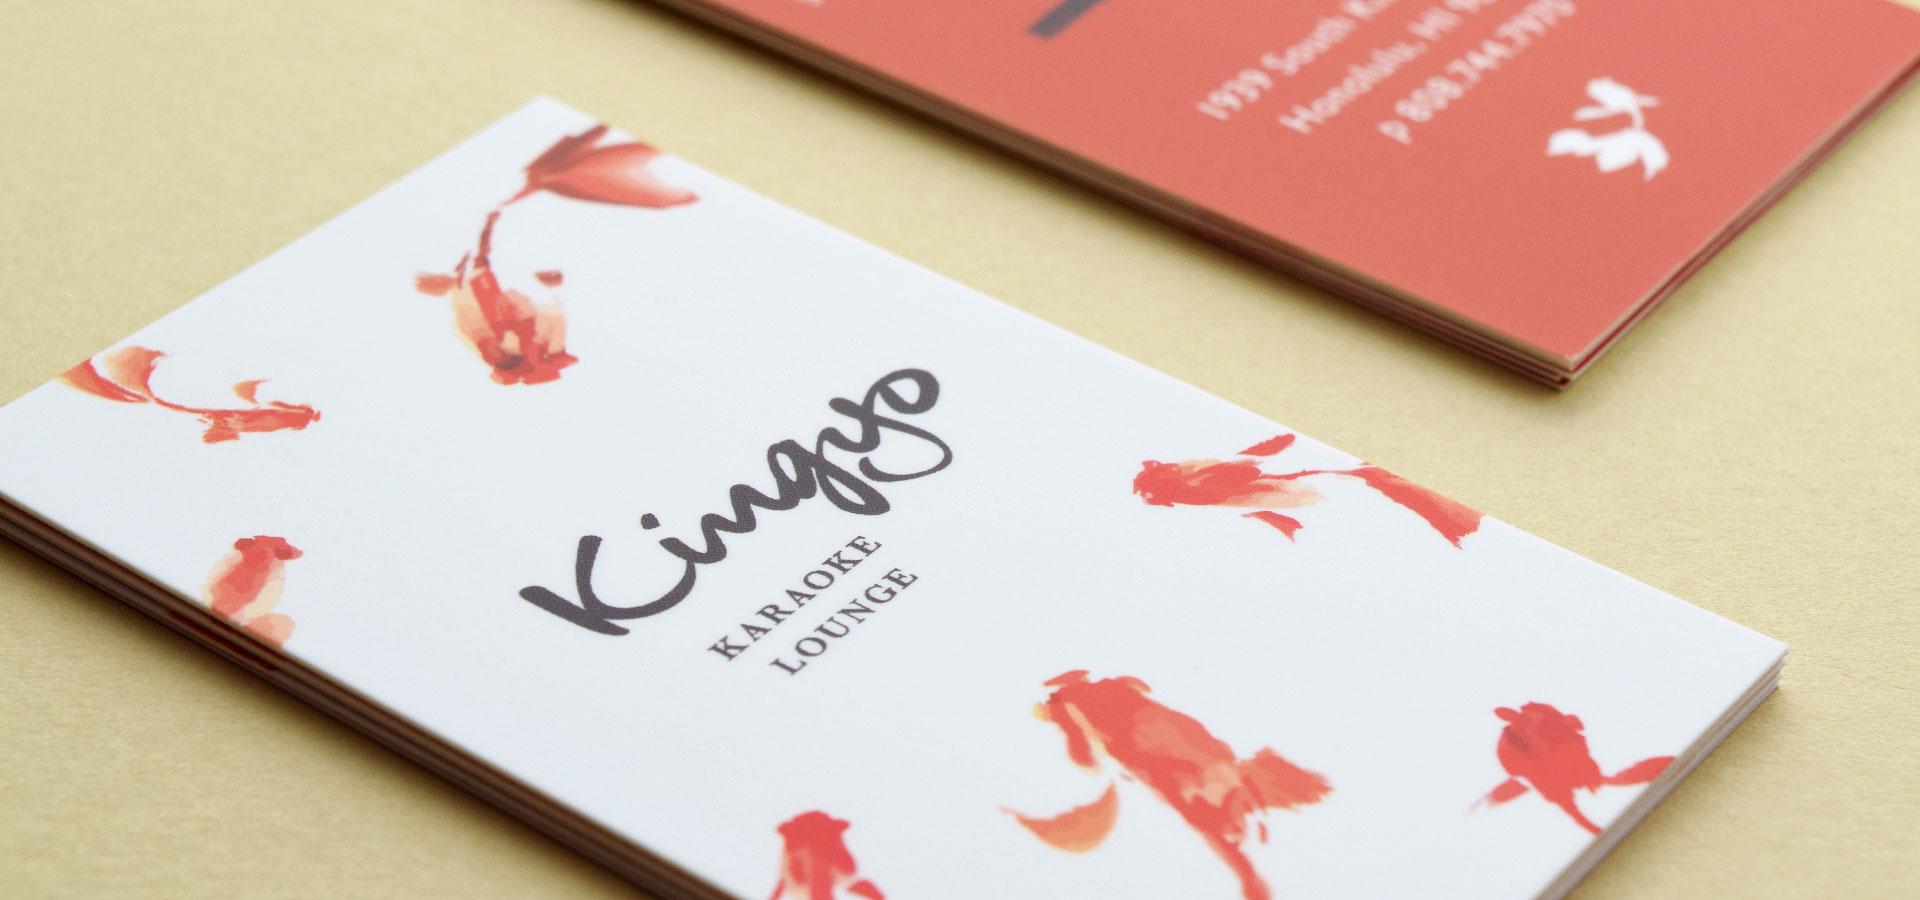 Kingyo Karaoke Bar Lounge Store Card